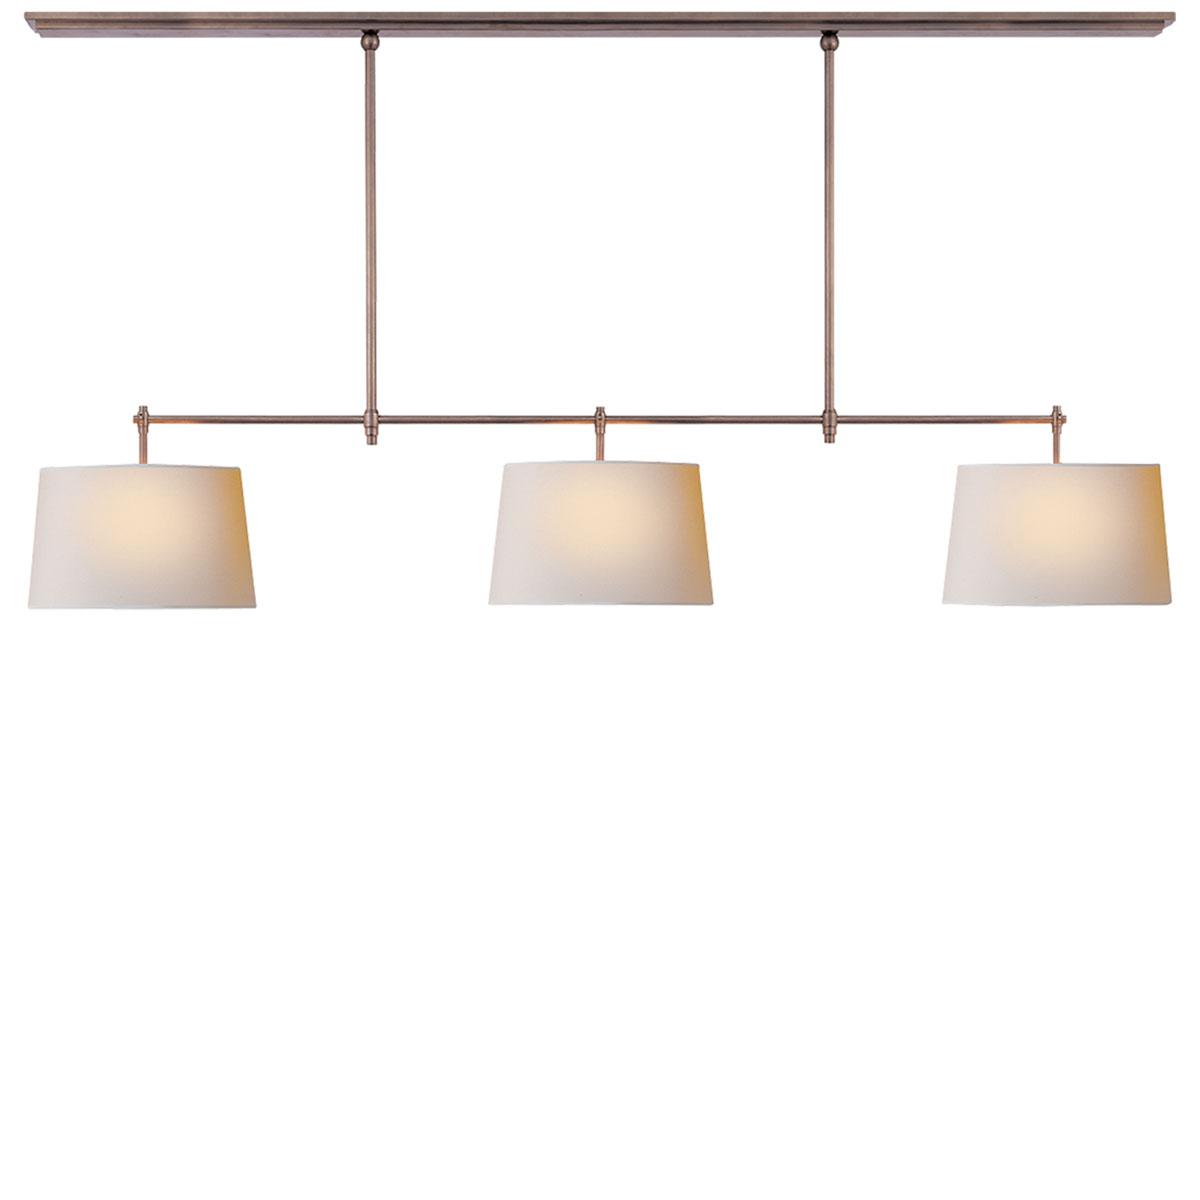 Visual comfort bryant large billiard pendant fixture neenas lighting antique nickel finish natural paper shade arubaitofo Gallery